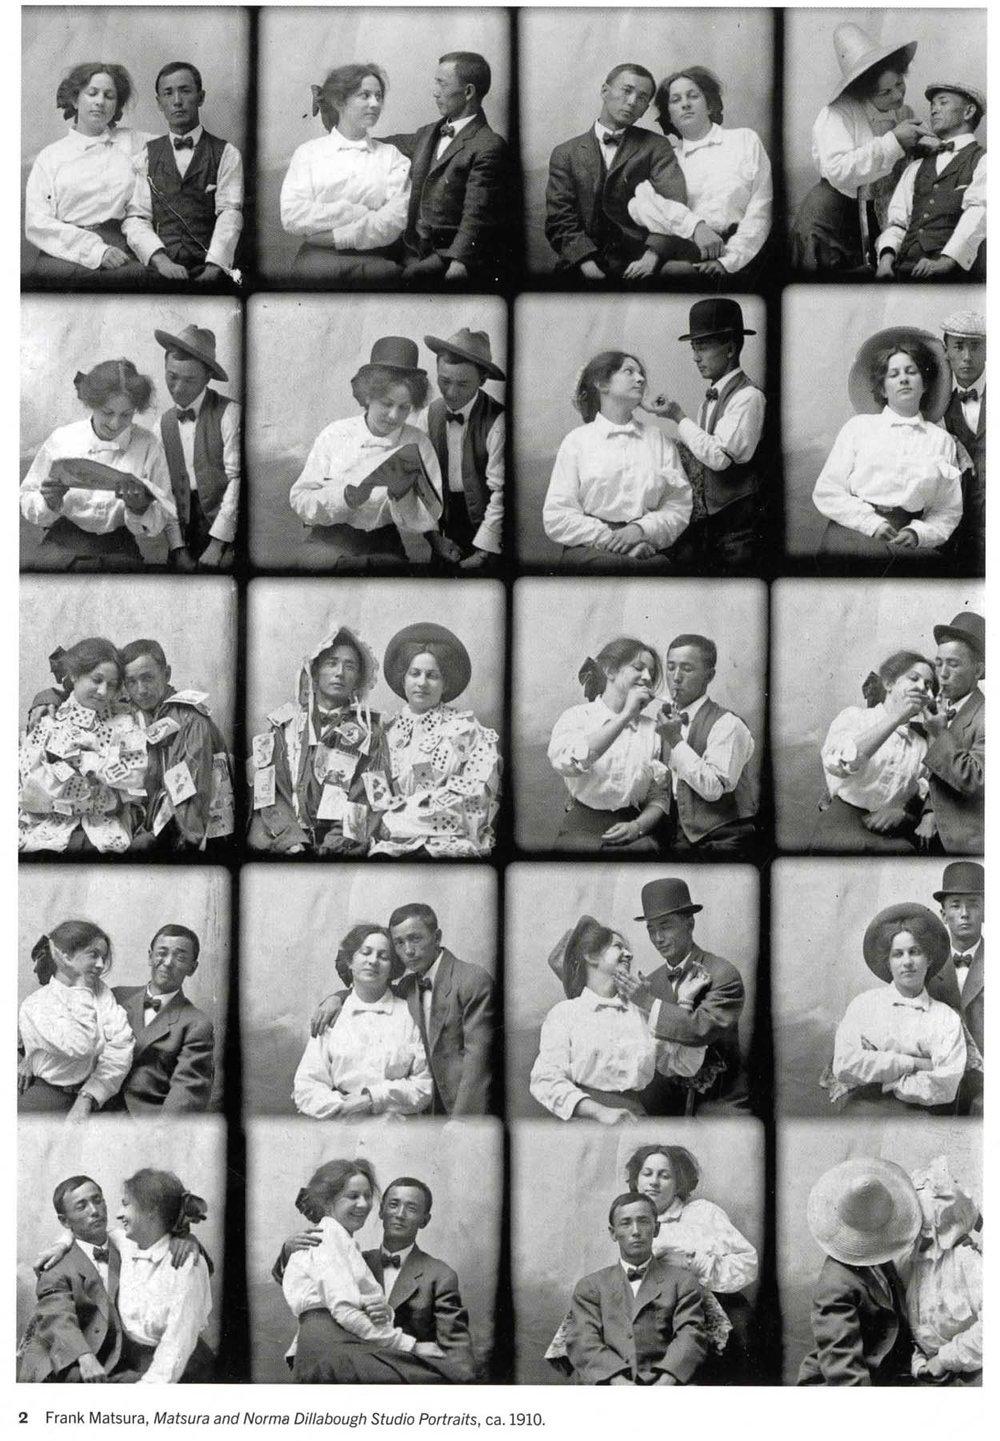 Matsura & Norma Dillabough Studio Portraits 1910